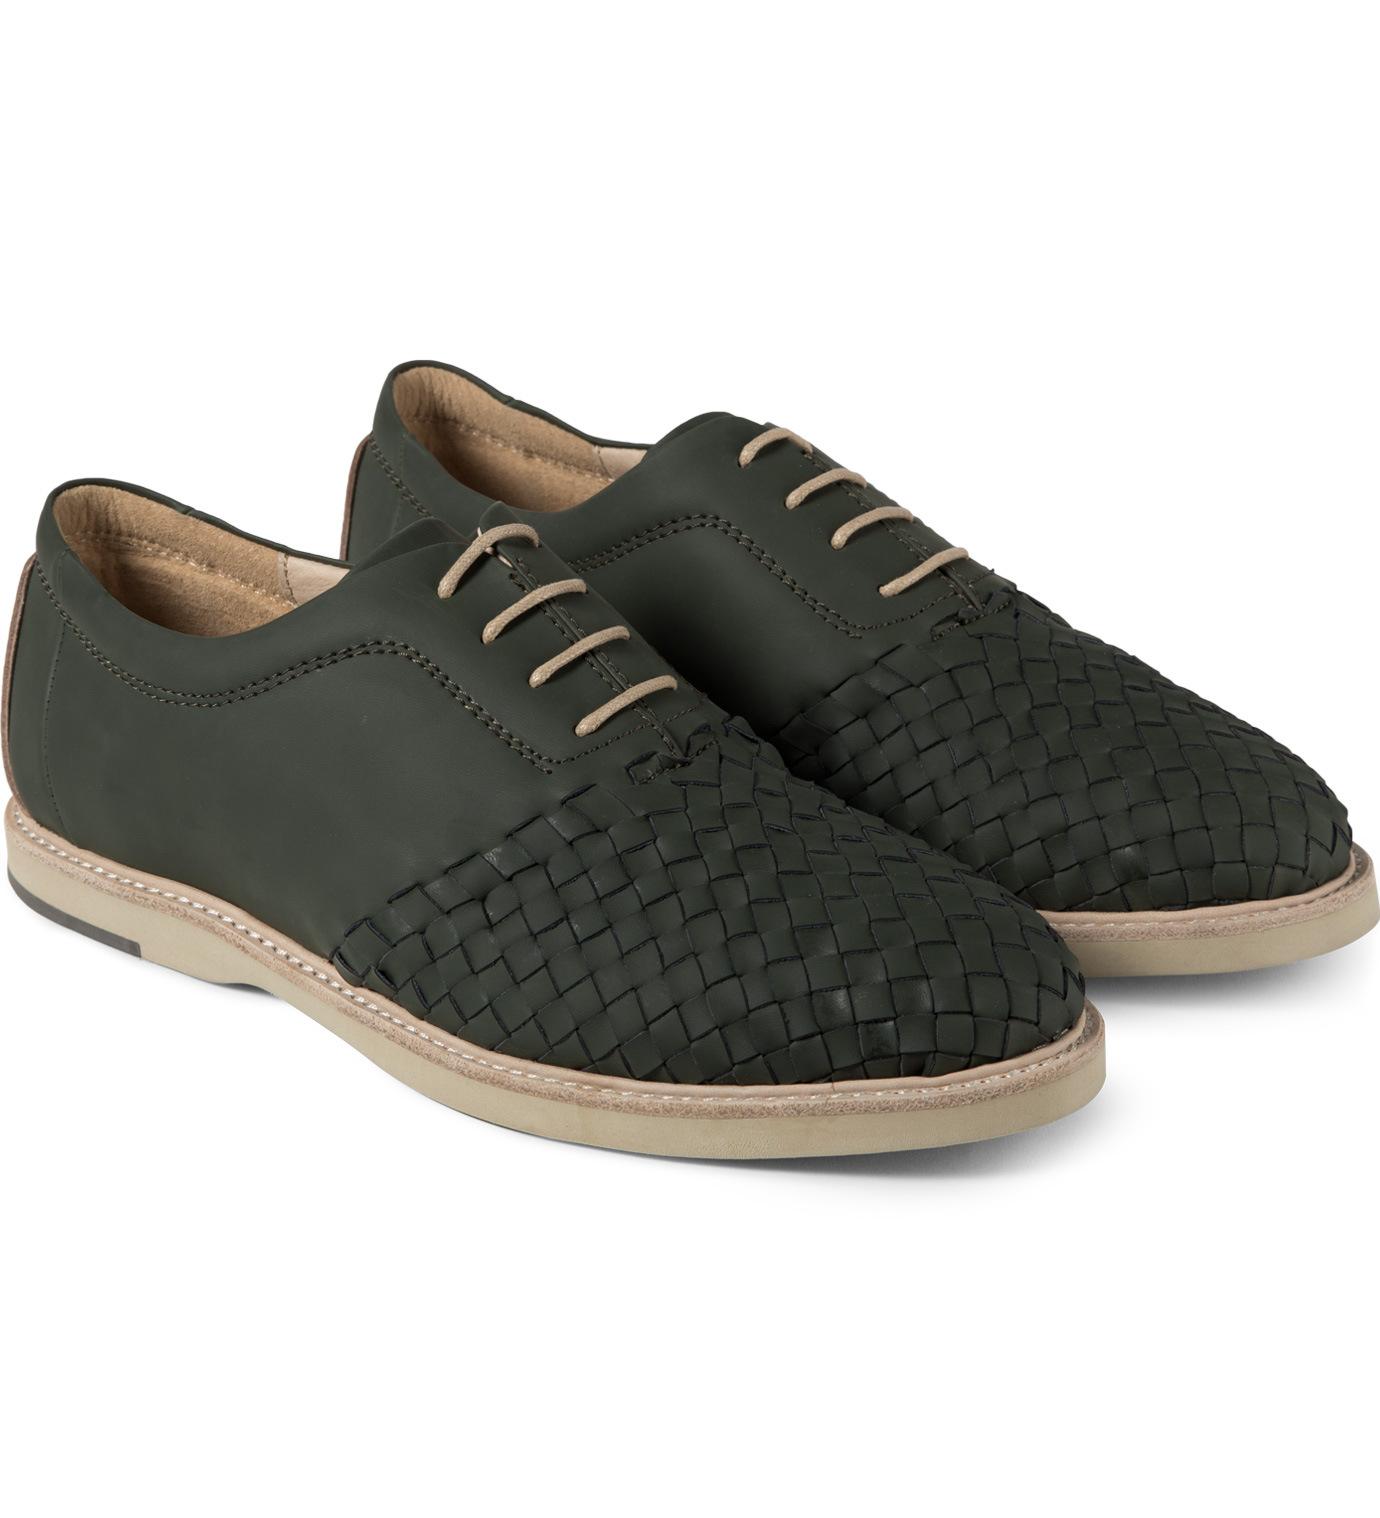 Ross Shoes 28 Images Barker Ross Shoes Selfridges Tcg Black Ross Shoes Hbx Ross Eel Skin